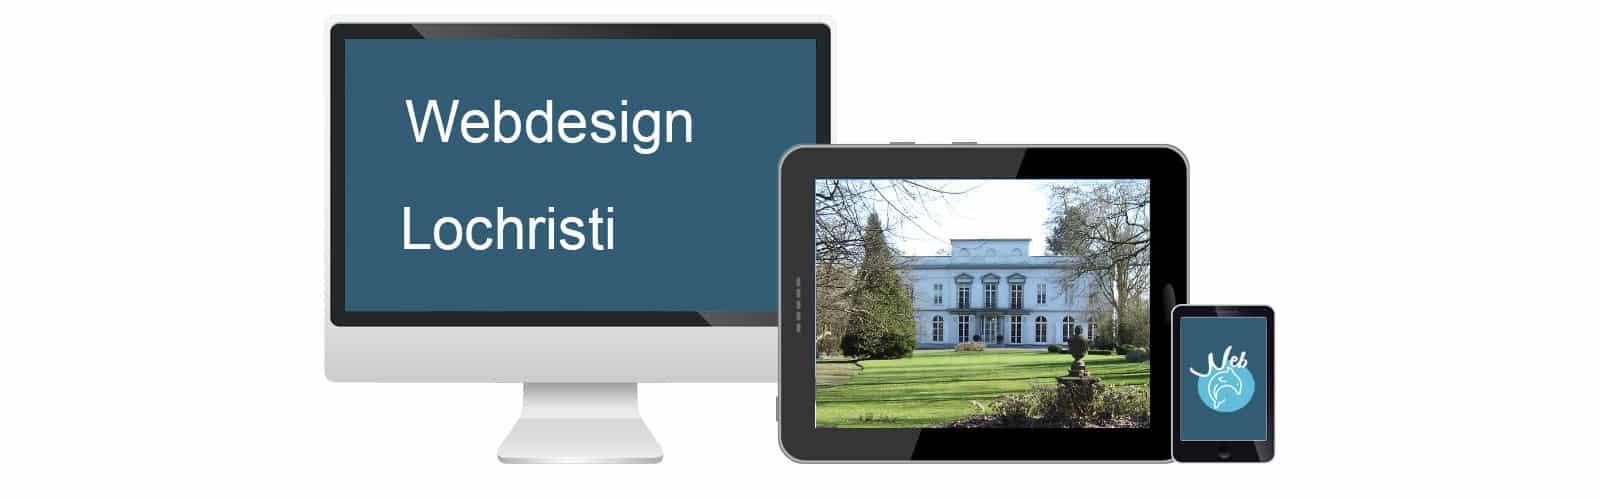 Webdesign Lochristi - webdolfijn